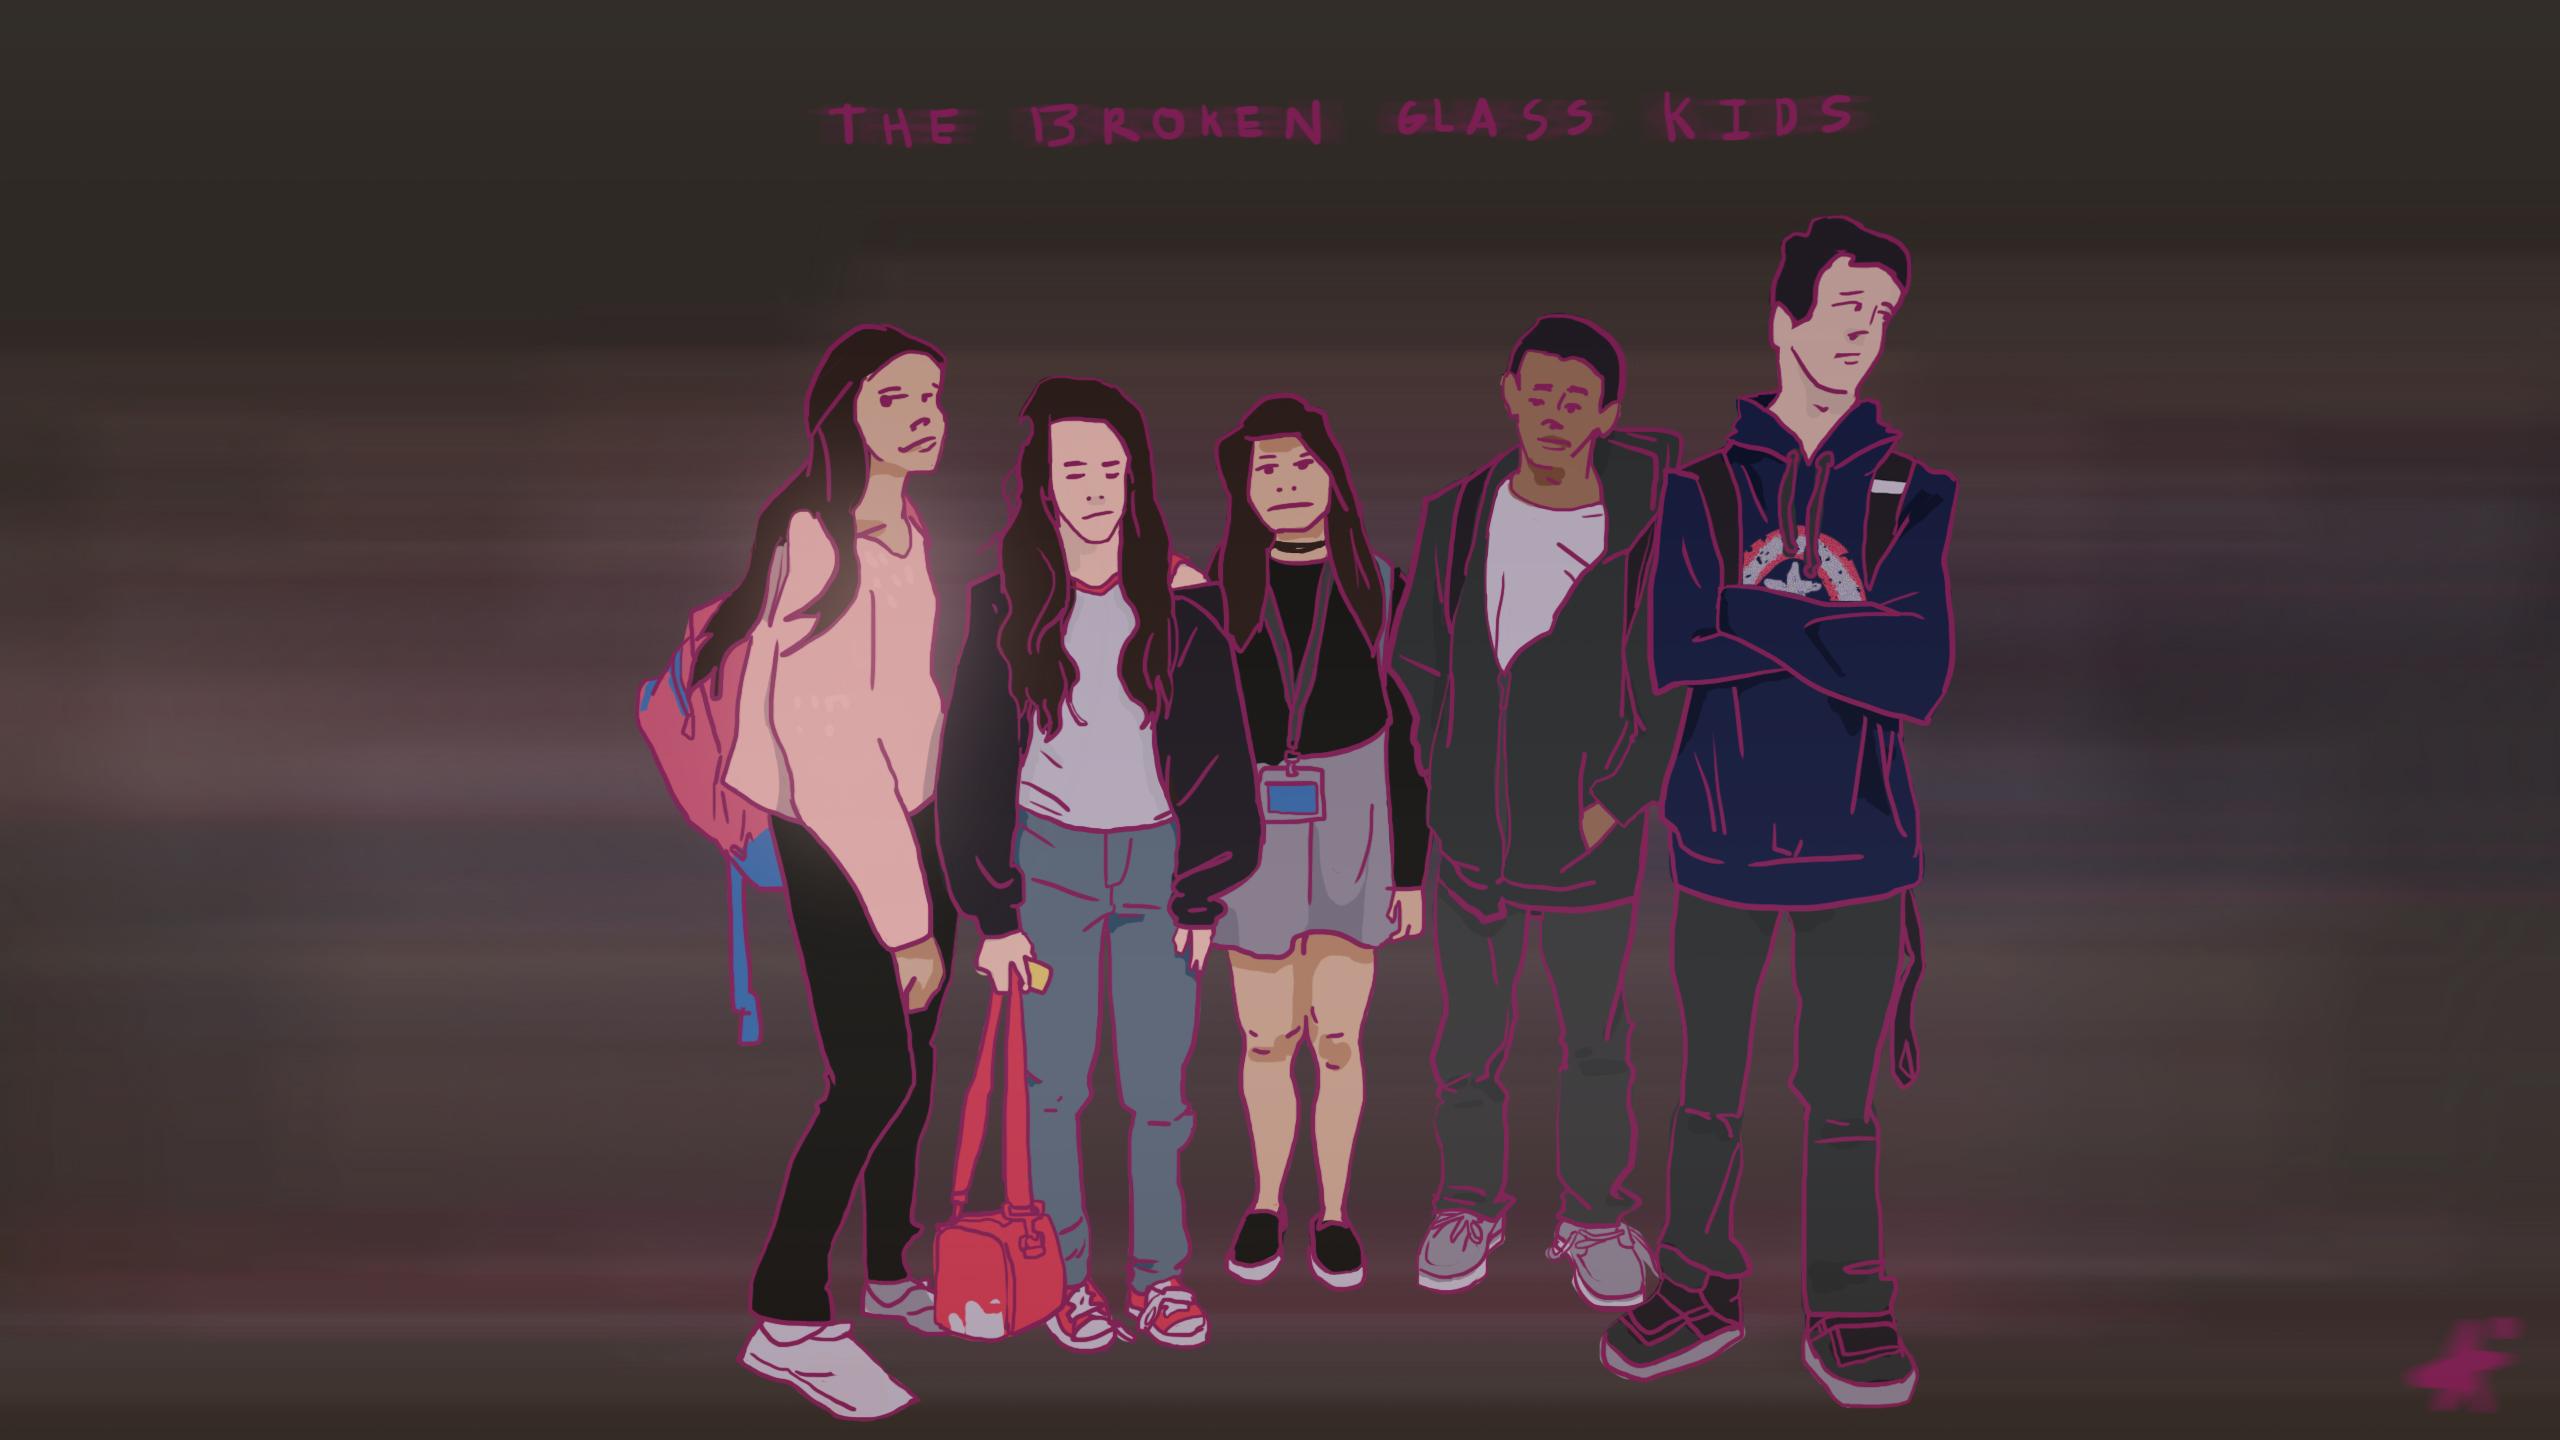 The Broken Glass Kids